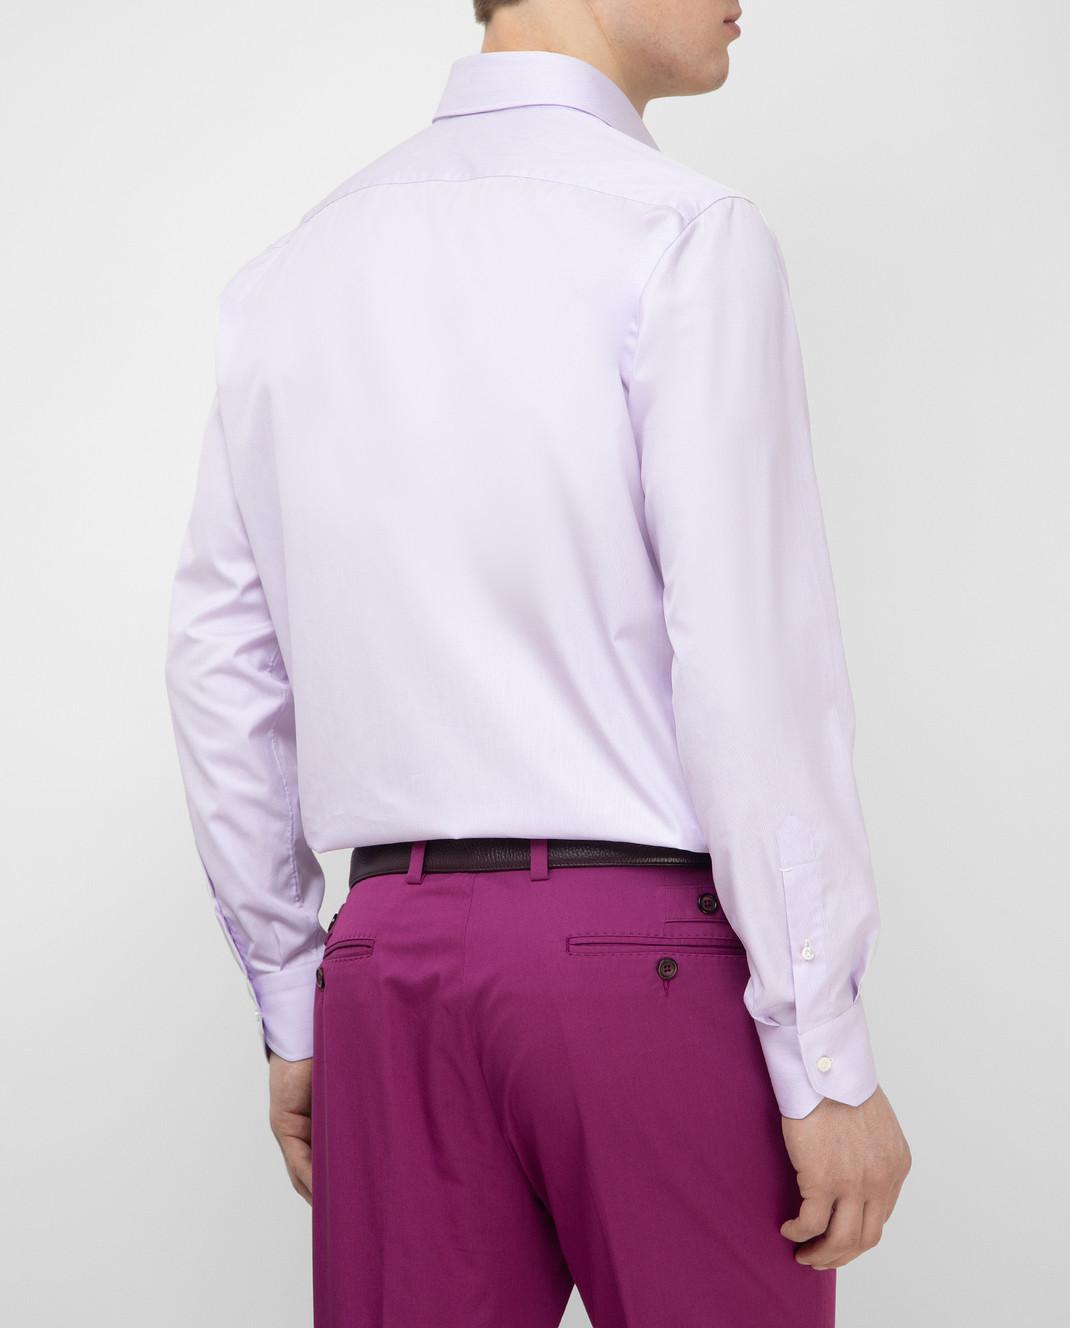 Luciano Lombardi Сиреневая рубашка 4653085 изображение 4